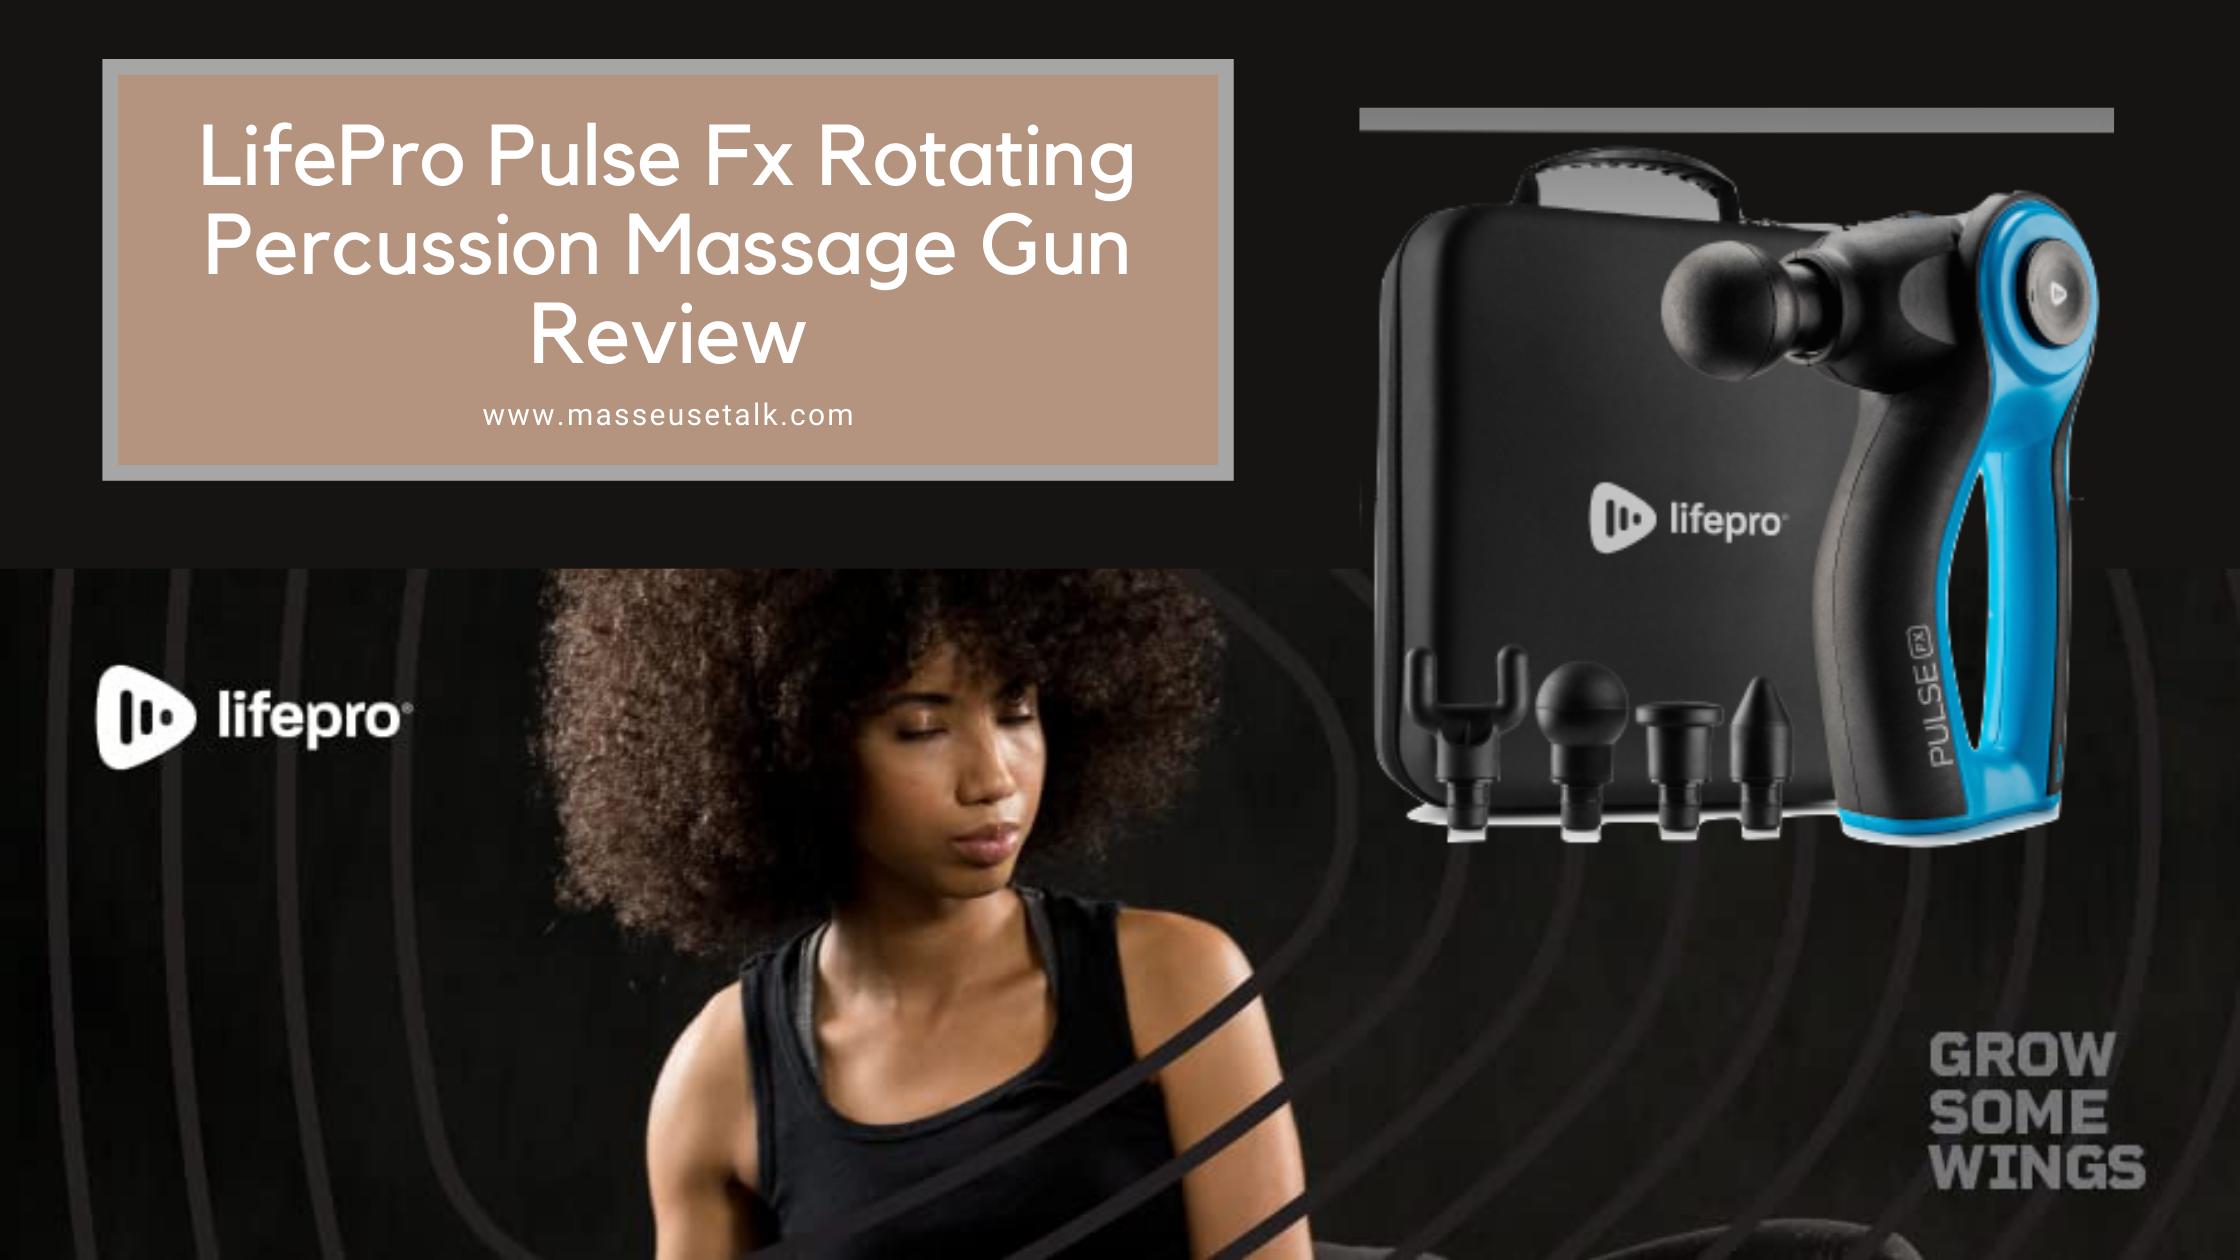 LifePro Pulse Fx Rotating Massage Gun